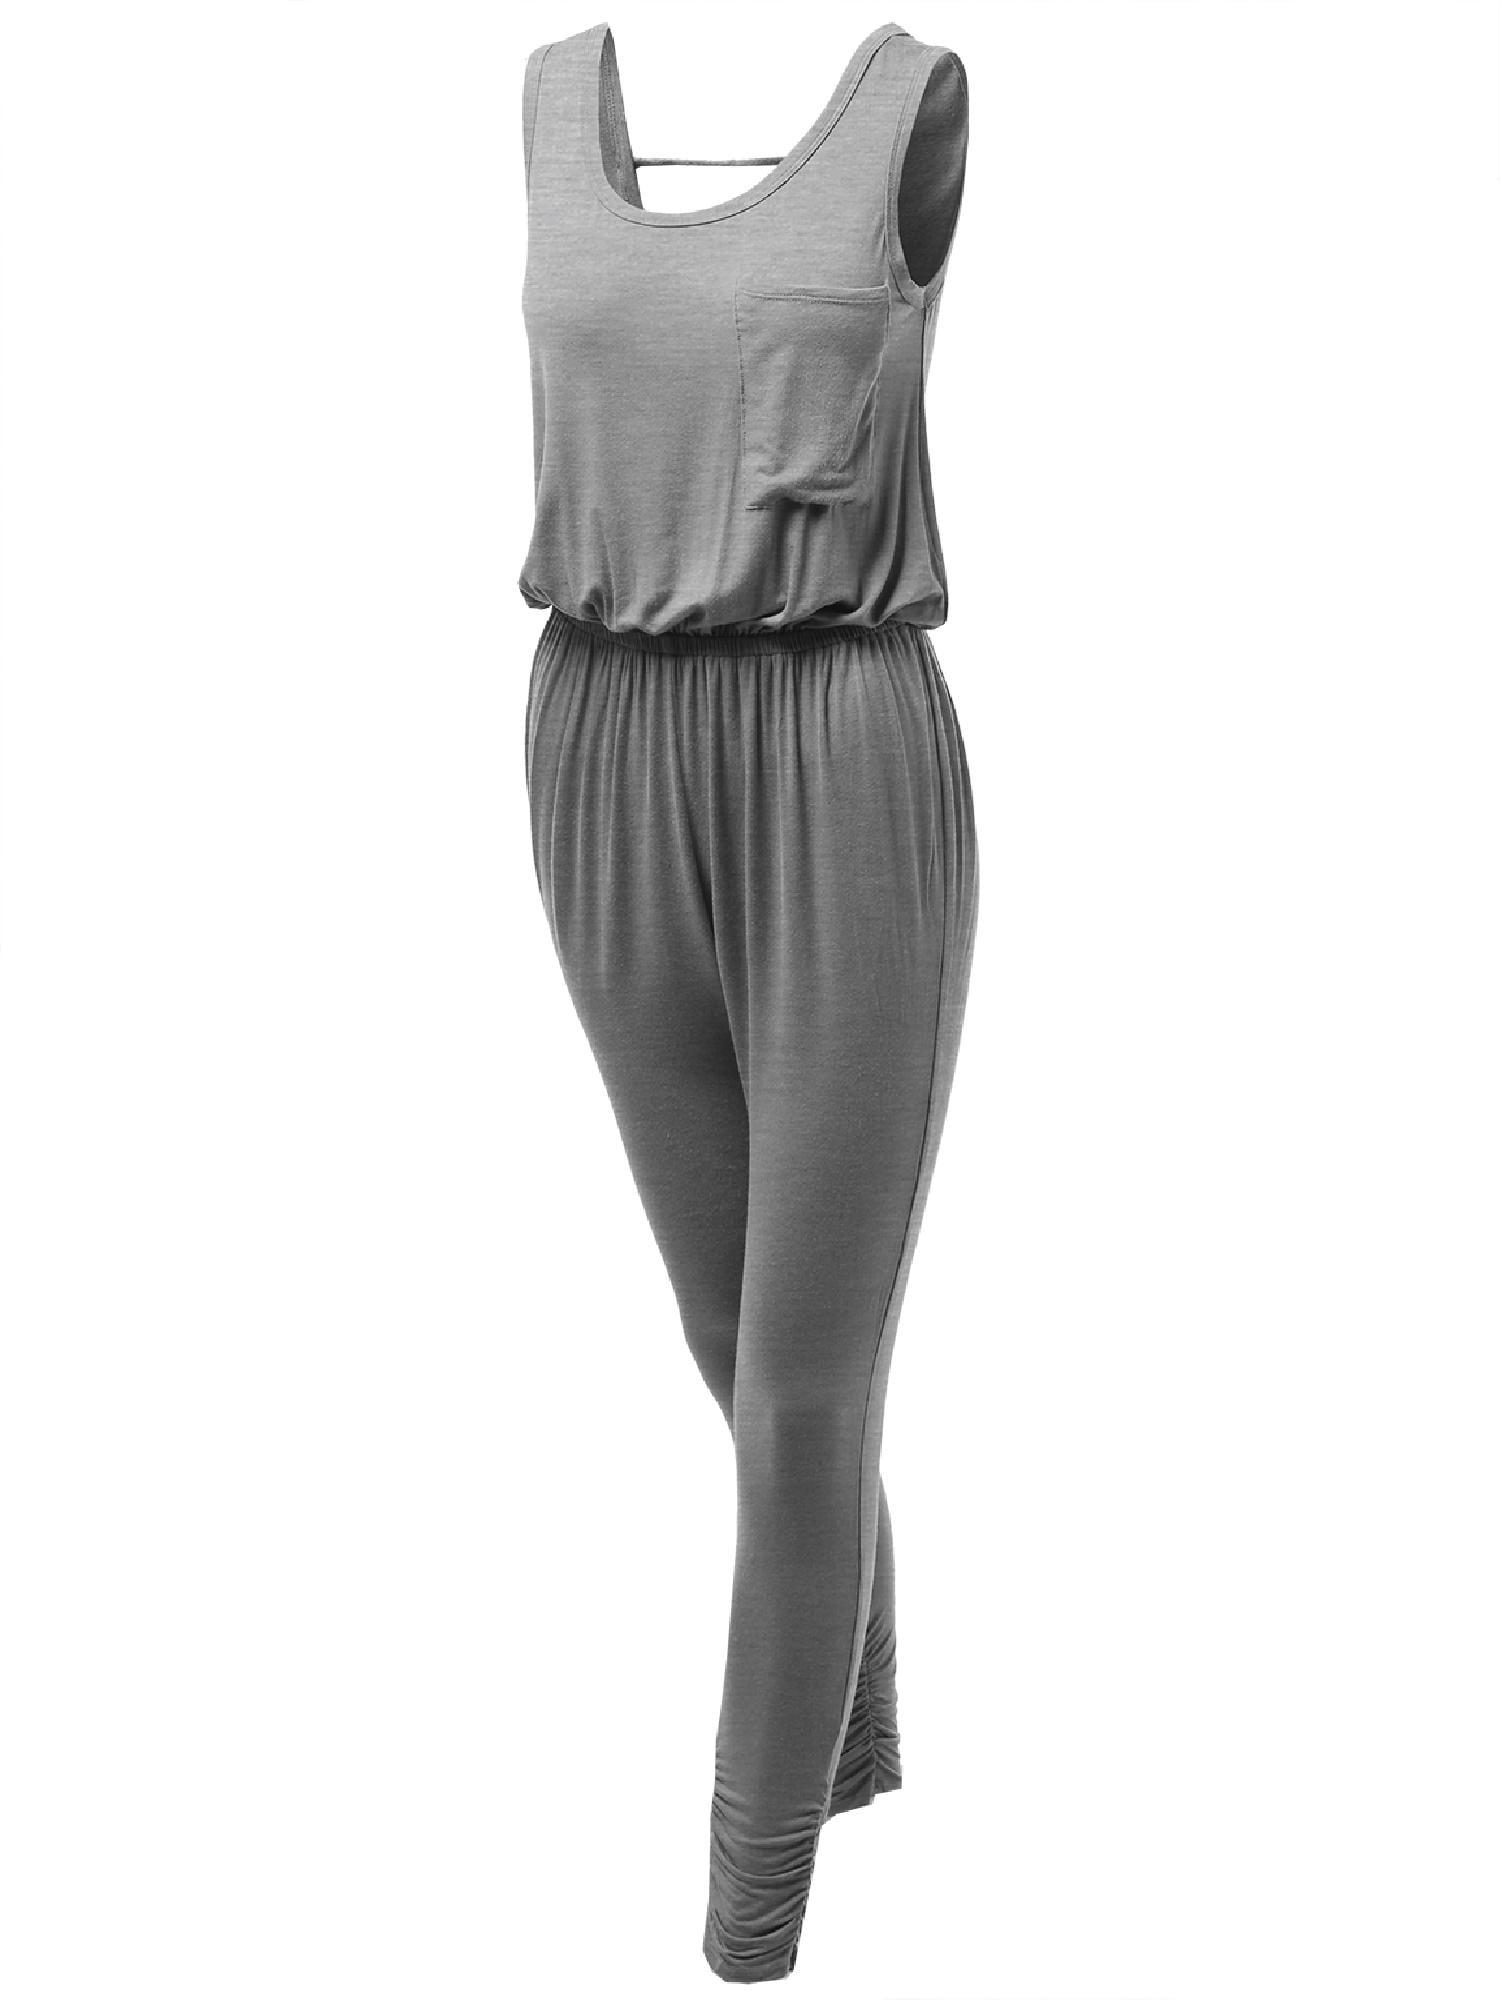 4333a1fdd48 FashionOutfit - FashionOutfit Women s Slim Fit Tank Shirring Detailed Jumpsuit  Rompers - Walmart.com